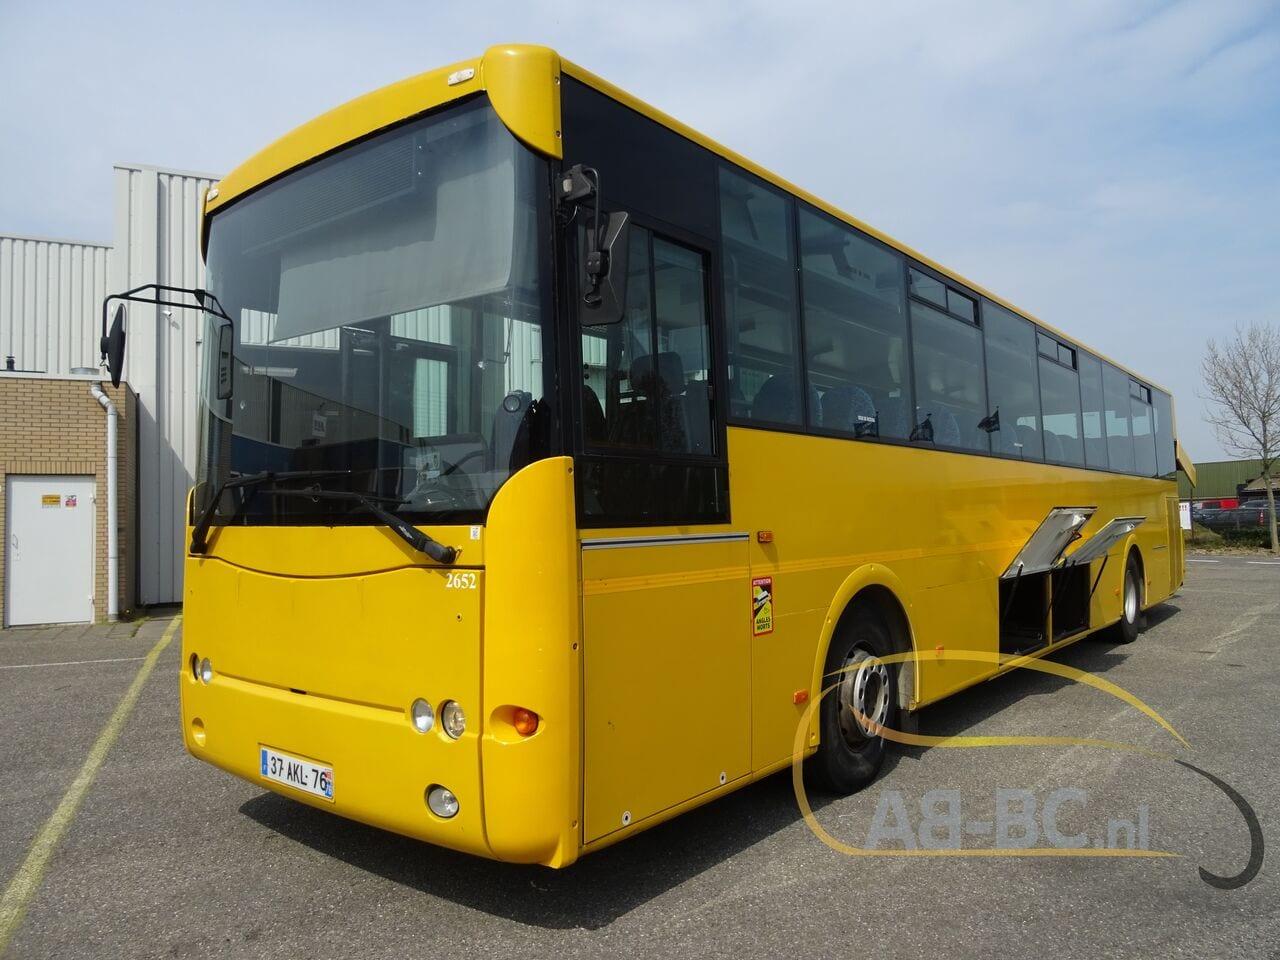 interurban-busMAN-Fast-64-seats---1619619803531468177_big_f5712e1b609e720f2e533390b73ed1f6--21042817163019598600